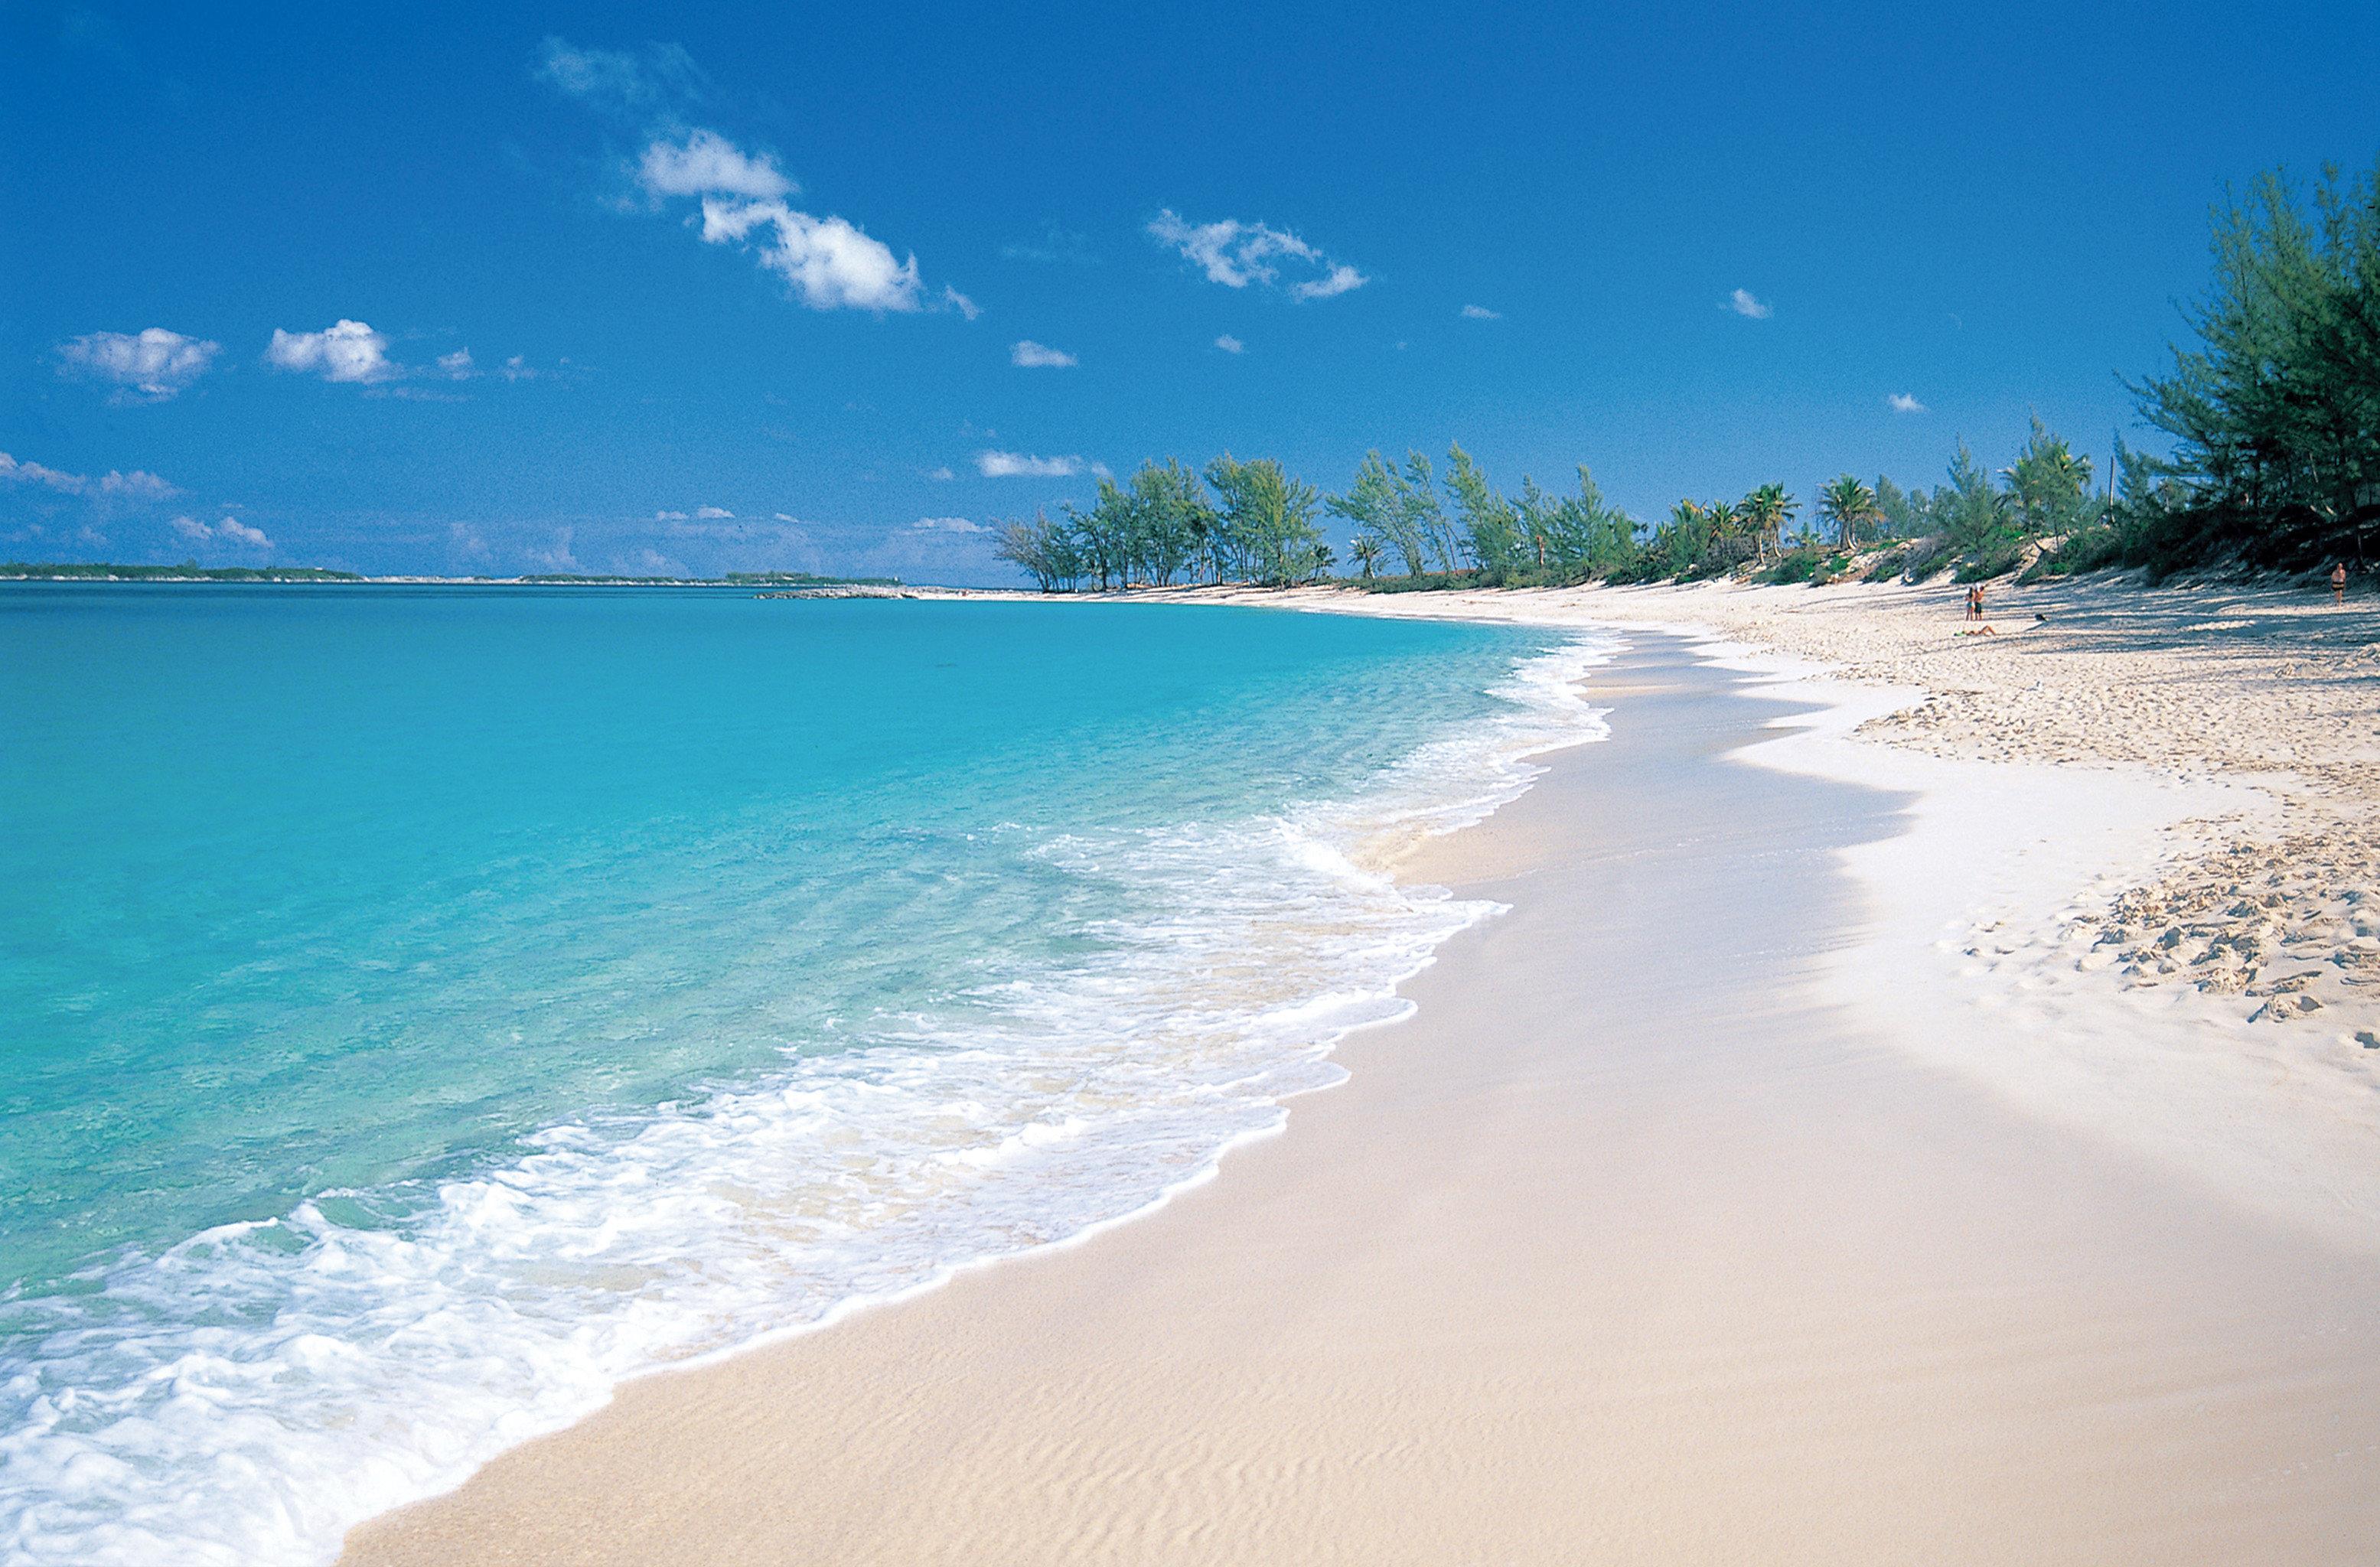 Beach Beachfront Family Grounds Hotels Play Scenic views Trip Ideas sky water Nature shore Sea Ocean horizon sand Coast wave wind wave caribbean cape sunlight Lagoon tropics sandy day